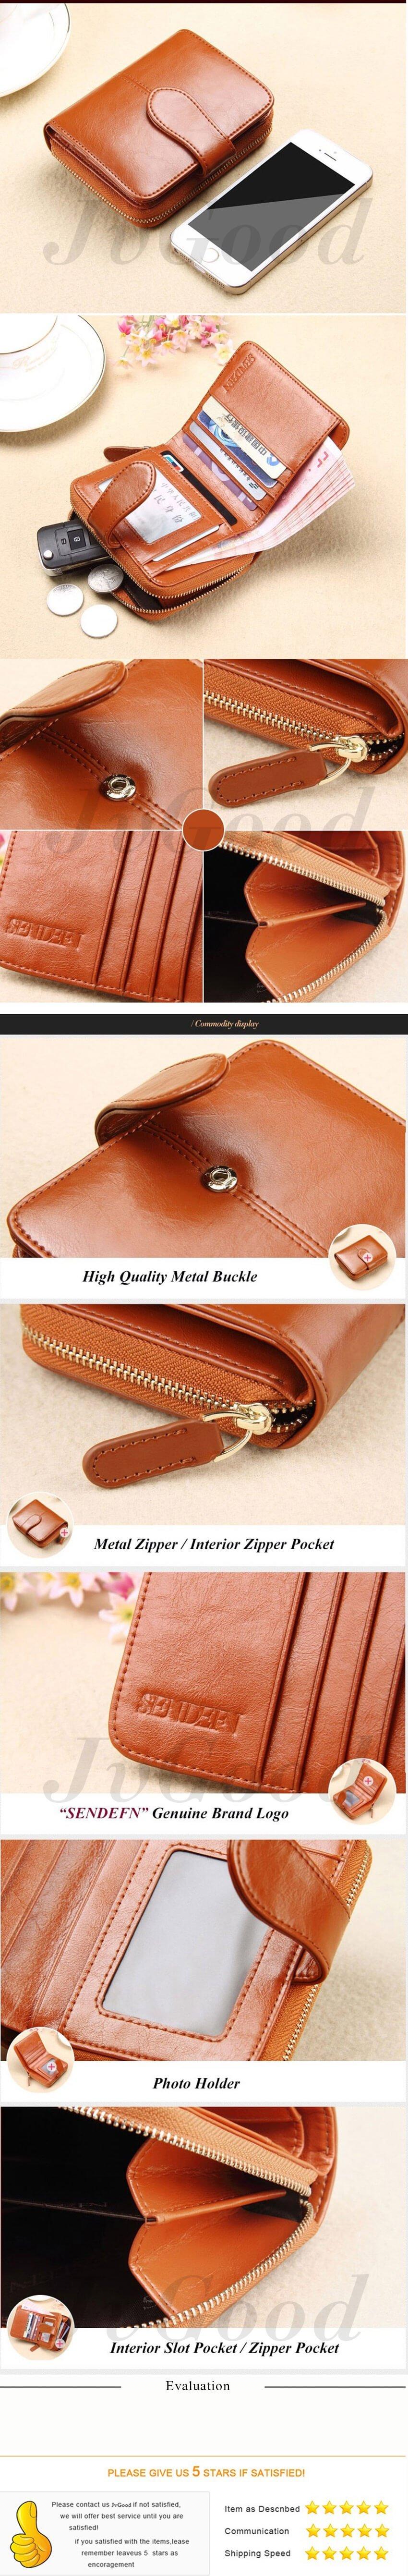 Product details of JvGood Oil Wax PU Leather Women Short Wallets Zipper Small Wallet Coin Pocket Credit Card Holder Handbag Female Purse Money Clip